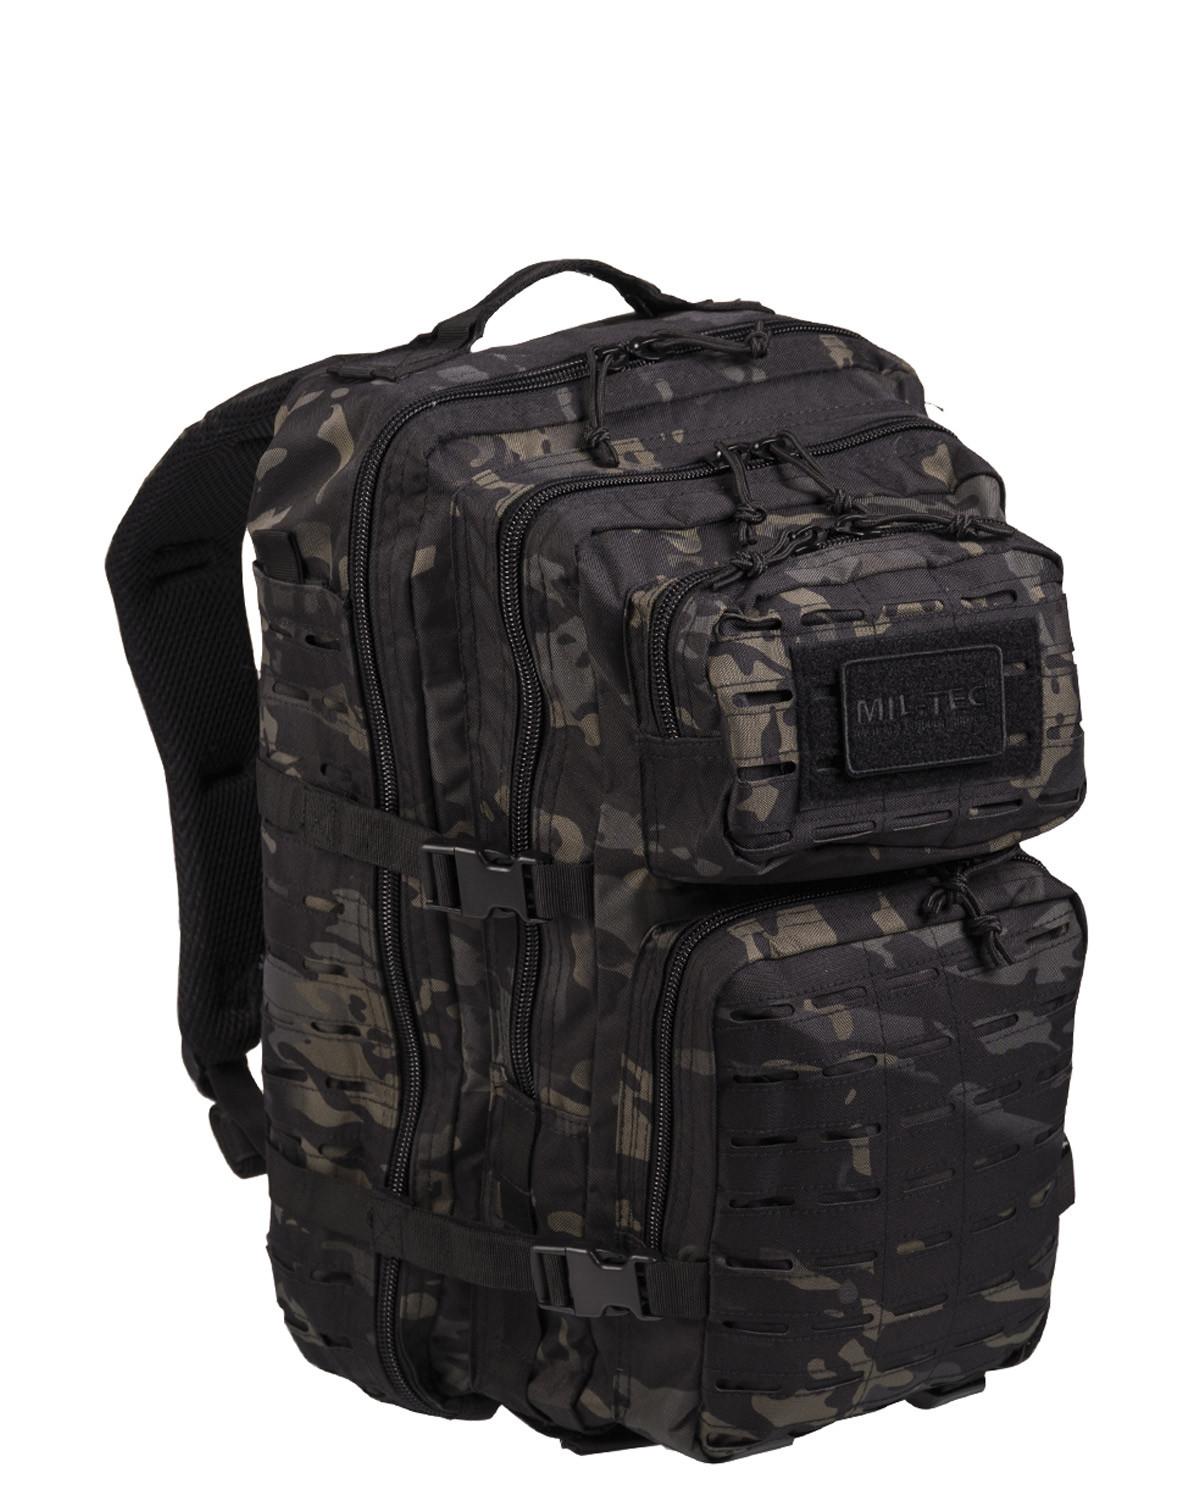 Mil-Tec US Assault Lasercut Ryggsäck m. Molle-system - Large (Dark Camo, One Size)